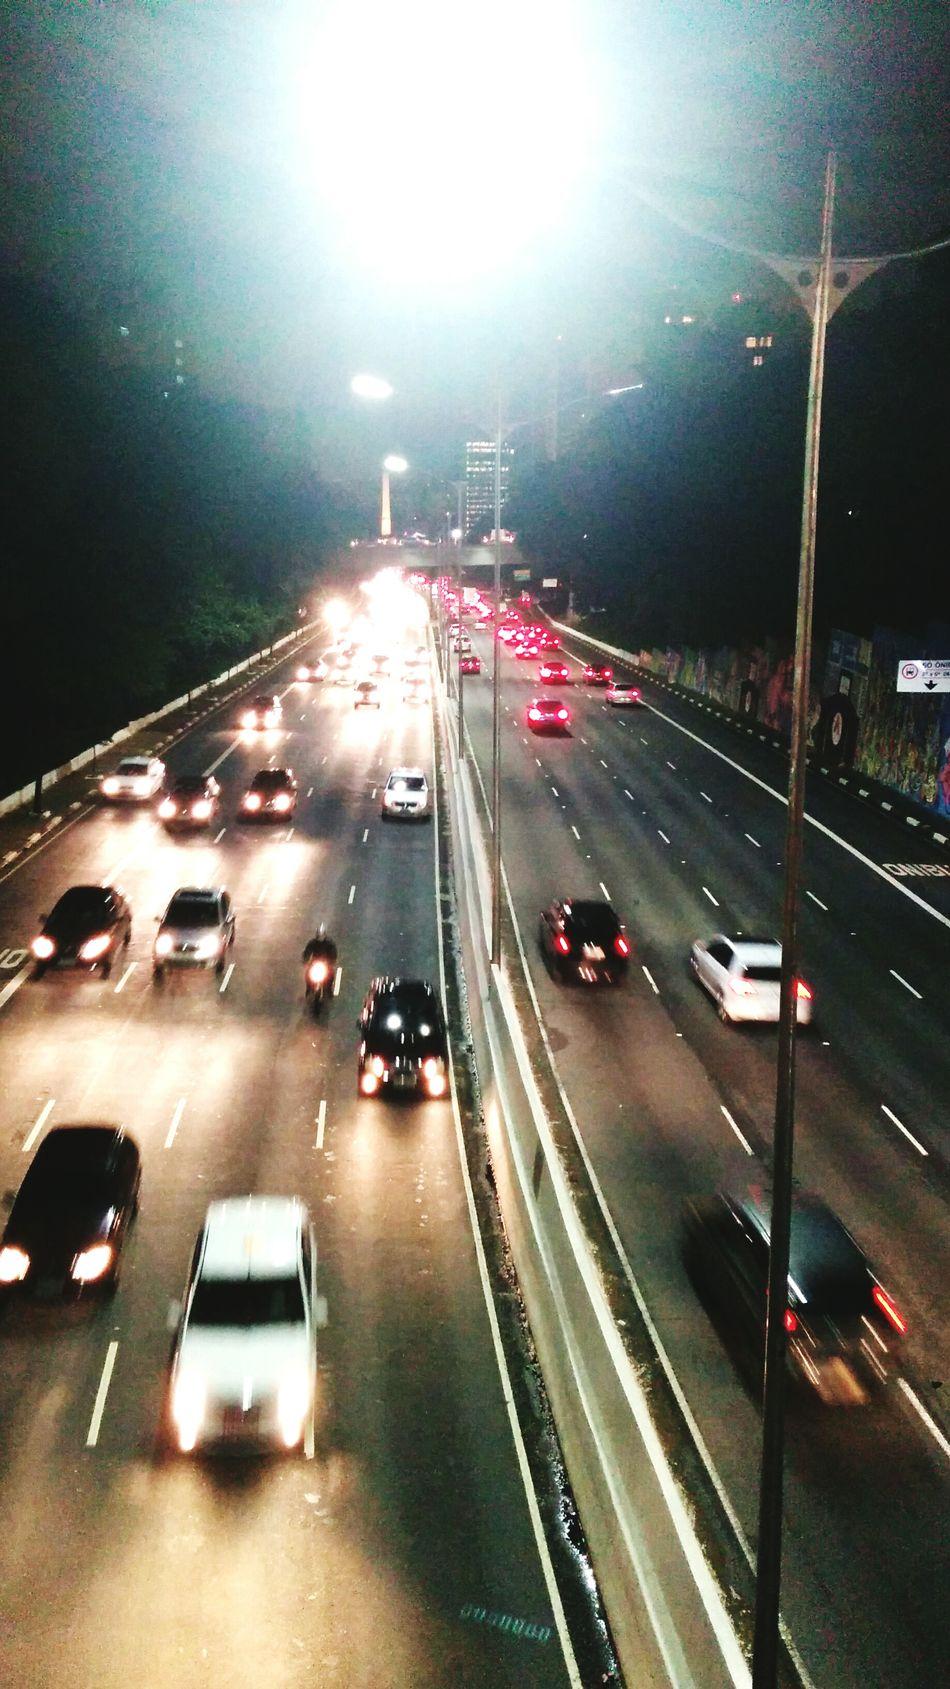 Rush! Rush! Rush! Talking Photos Walking Around Enjoying Life Taking Photos Light Avenue Cars Night Rush Hour Sao Paulo - Brazil